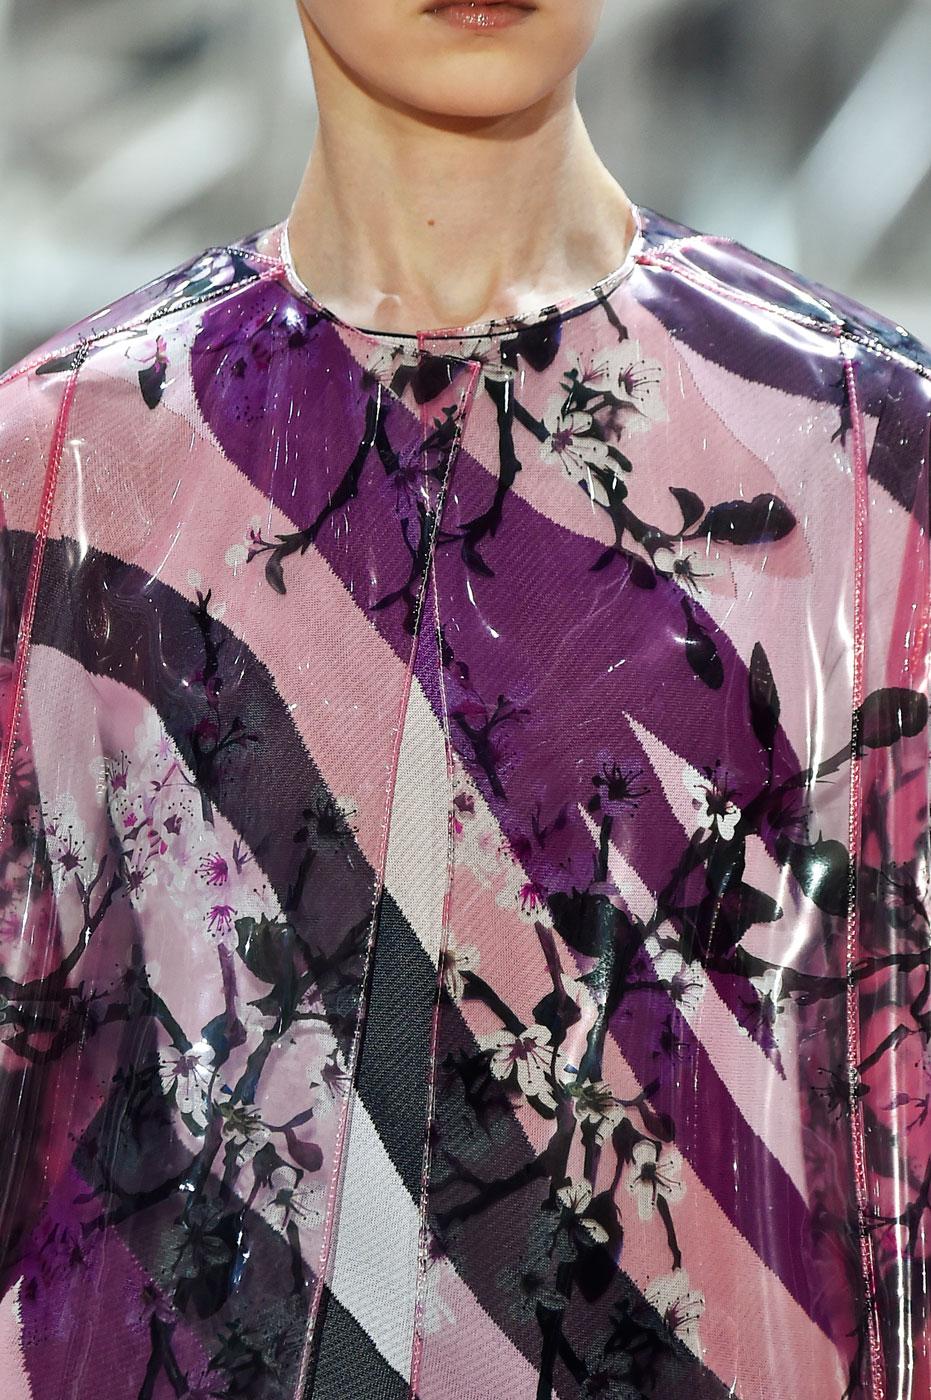 Christian-Dior-fashion-runway-show-close-ups-haute-couture-paris-spring-summer-2015-the-impression-106